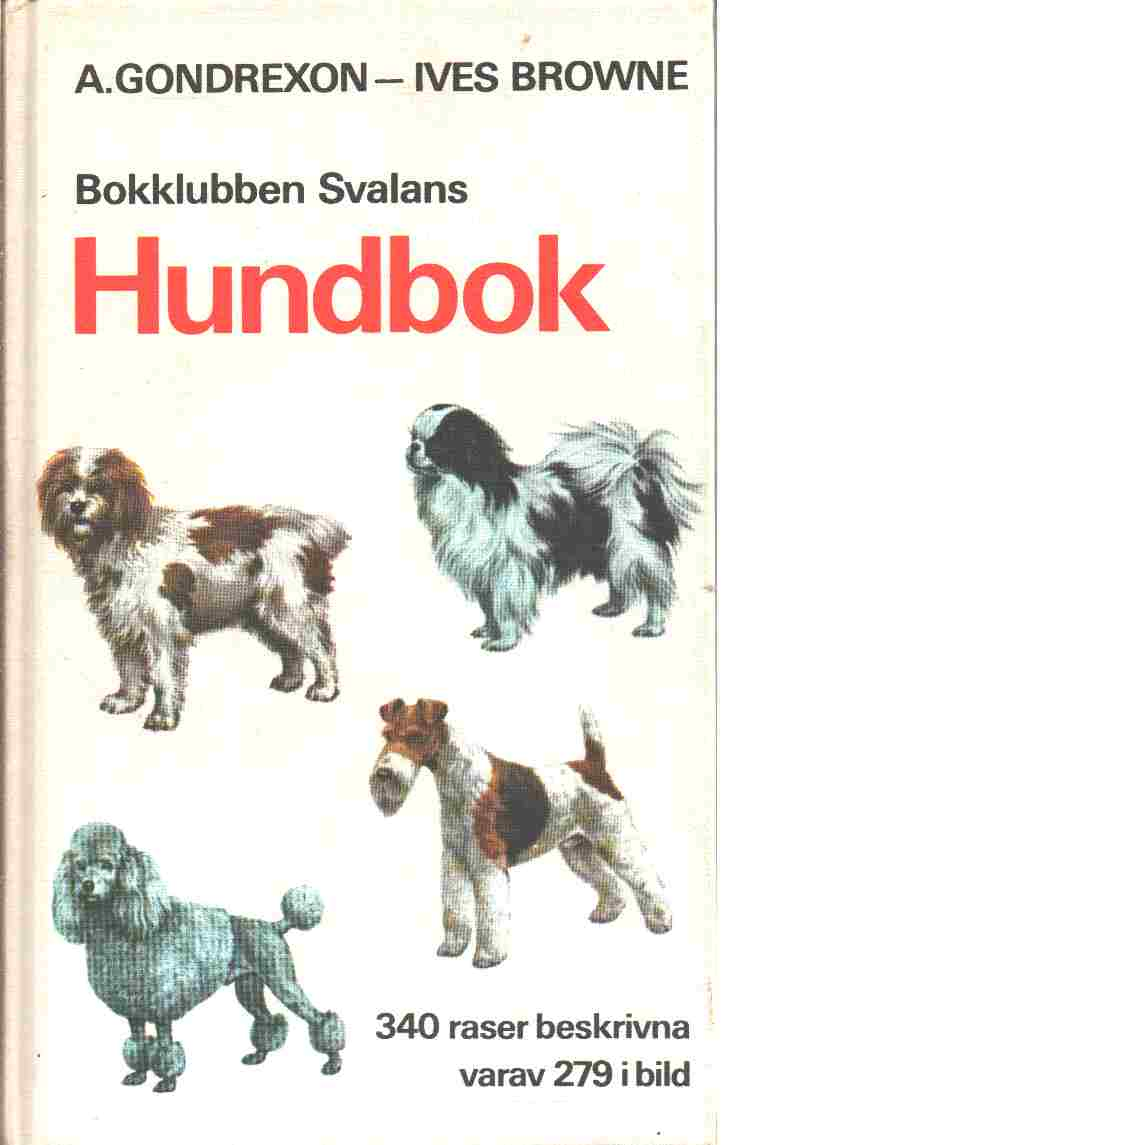 Bokklubben Svalans hundbok - Gondrexon-Ives Browne, Anna